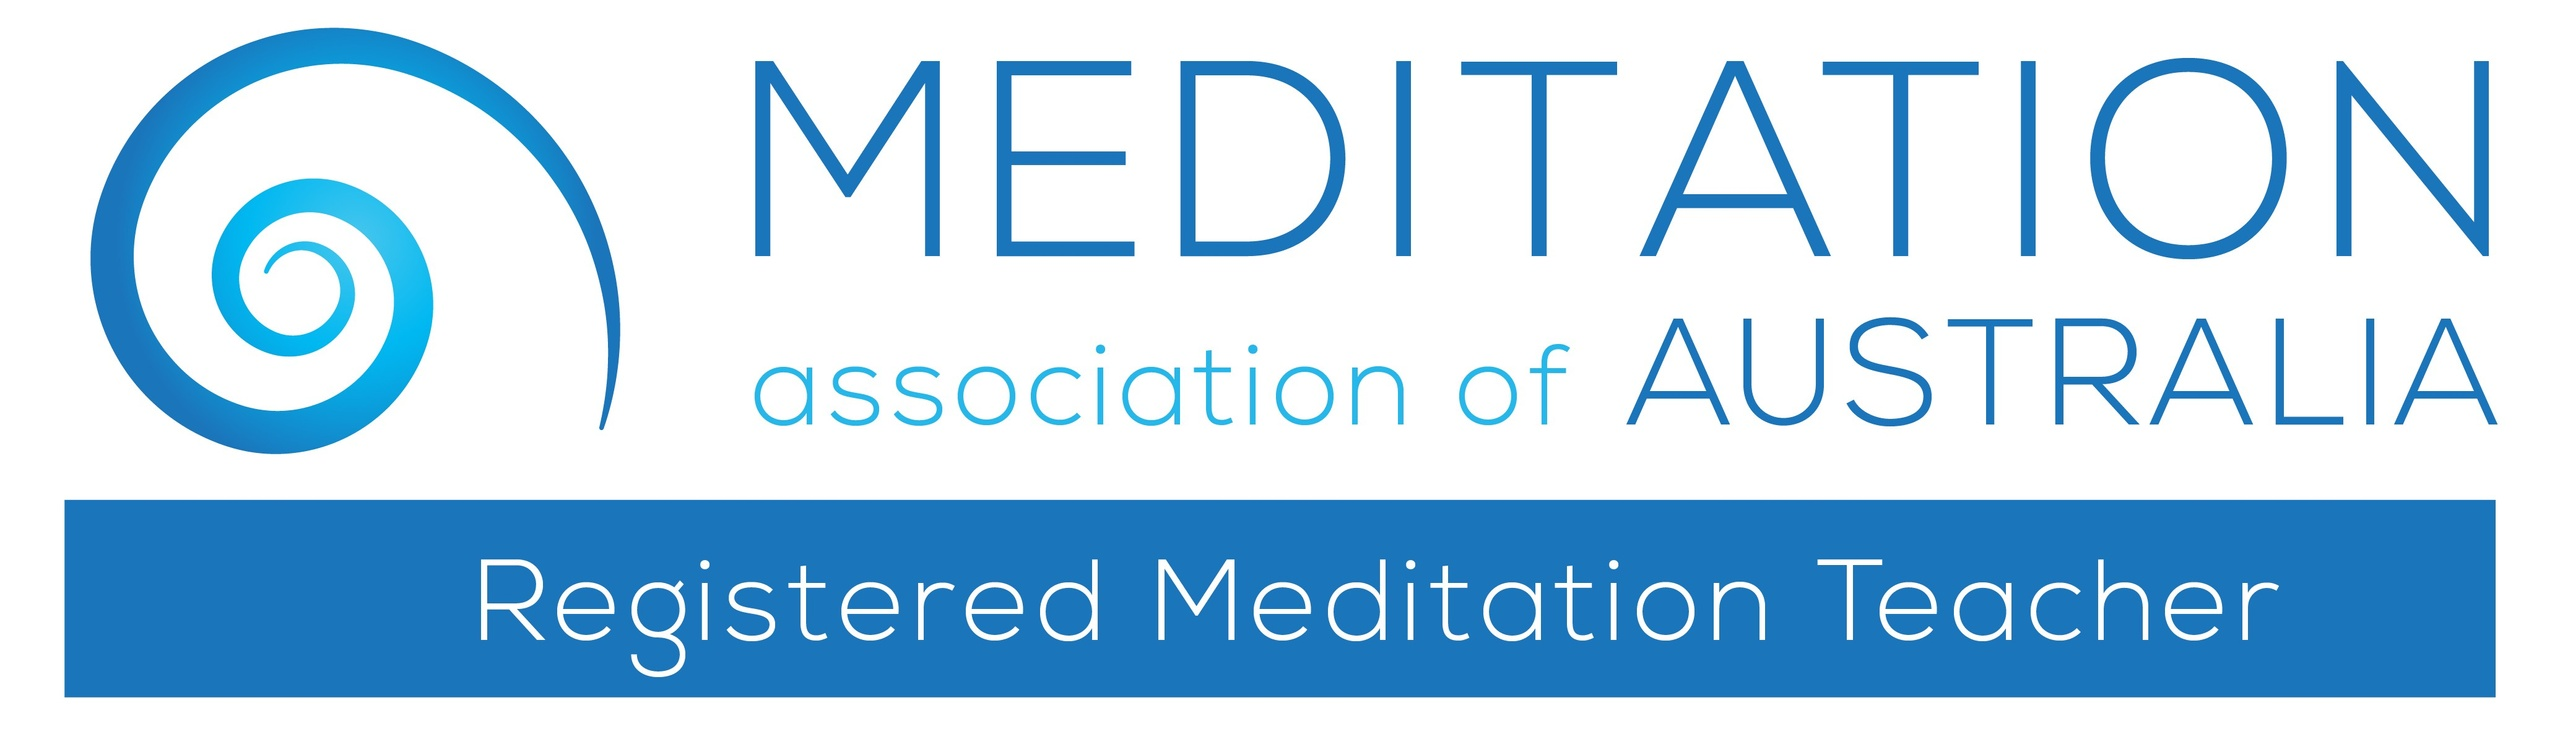 Meditation Australia logo